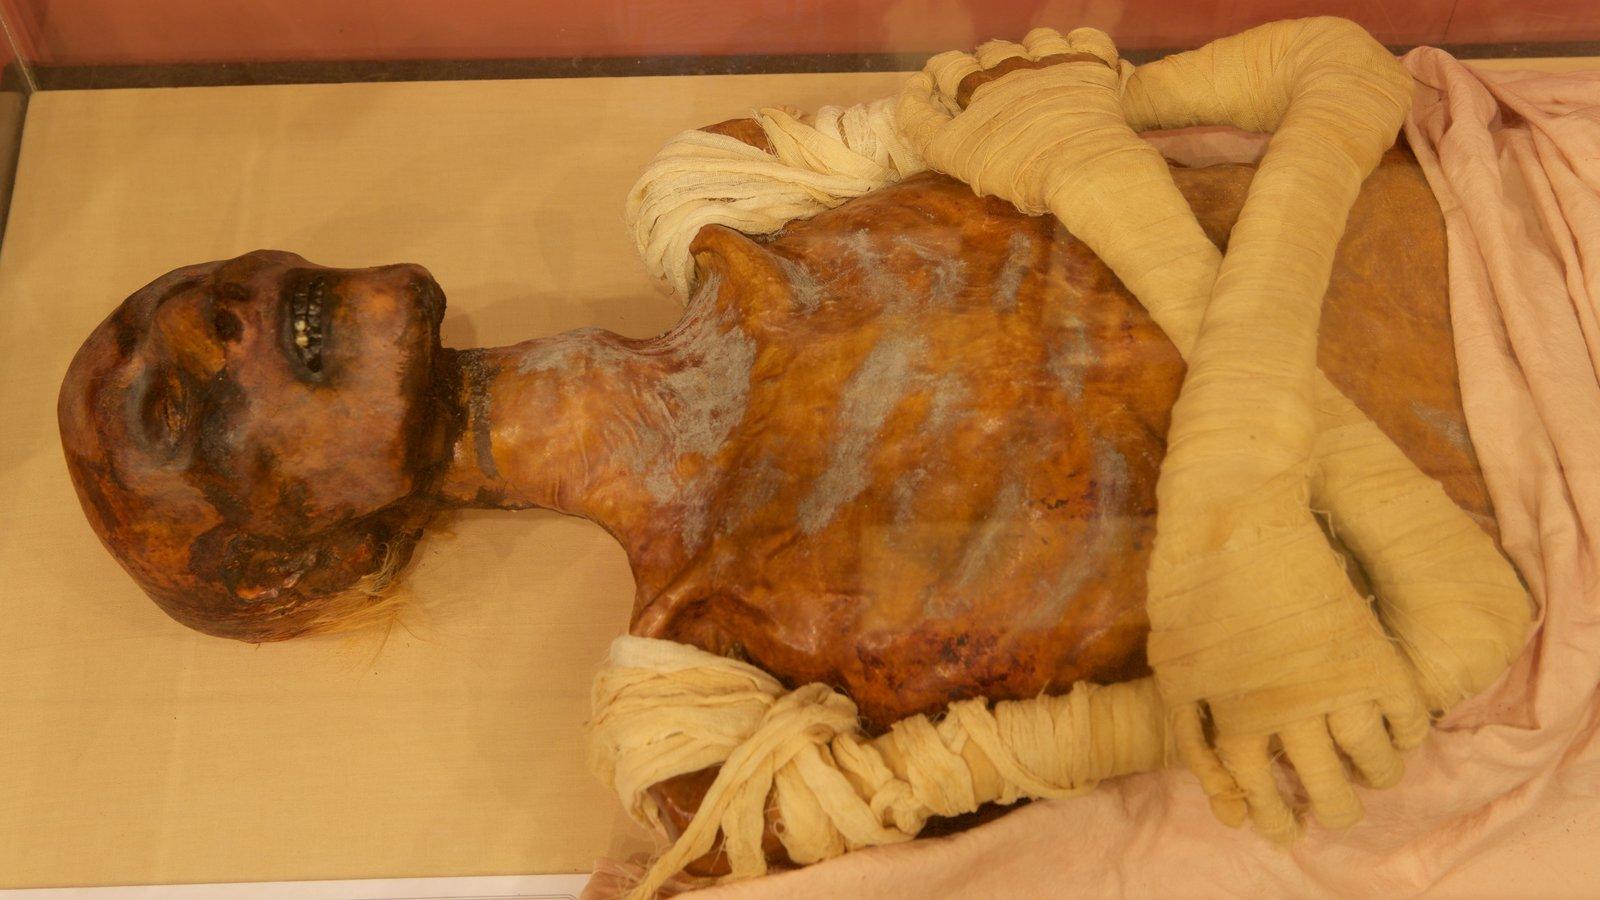 Tutankamon a exposição mostrando elementos de patrimônio